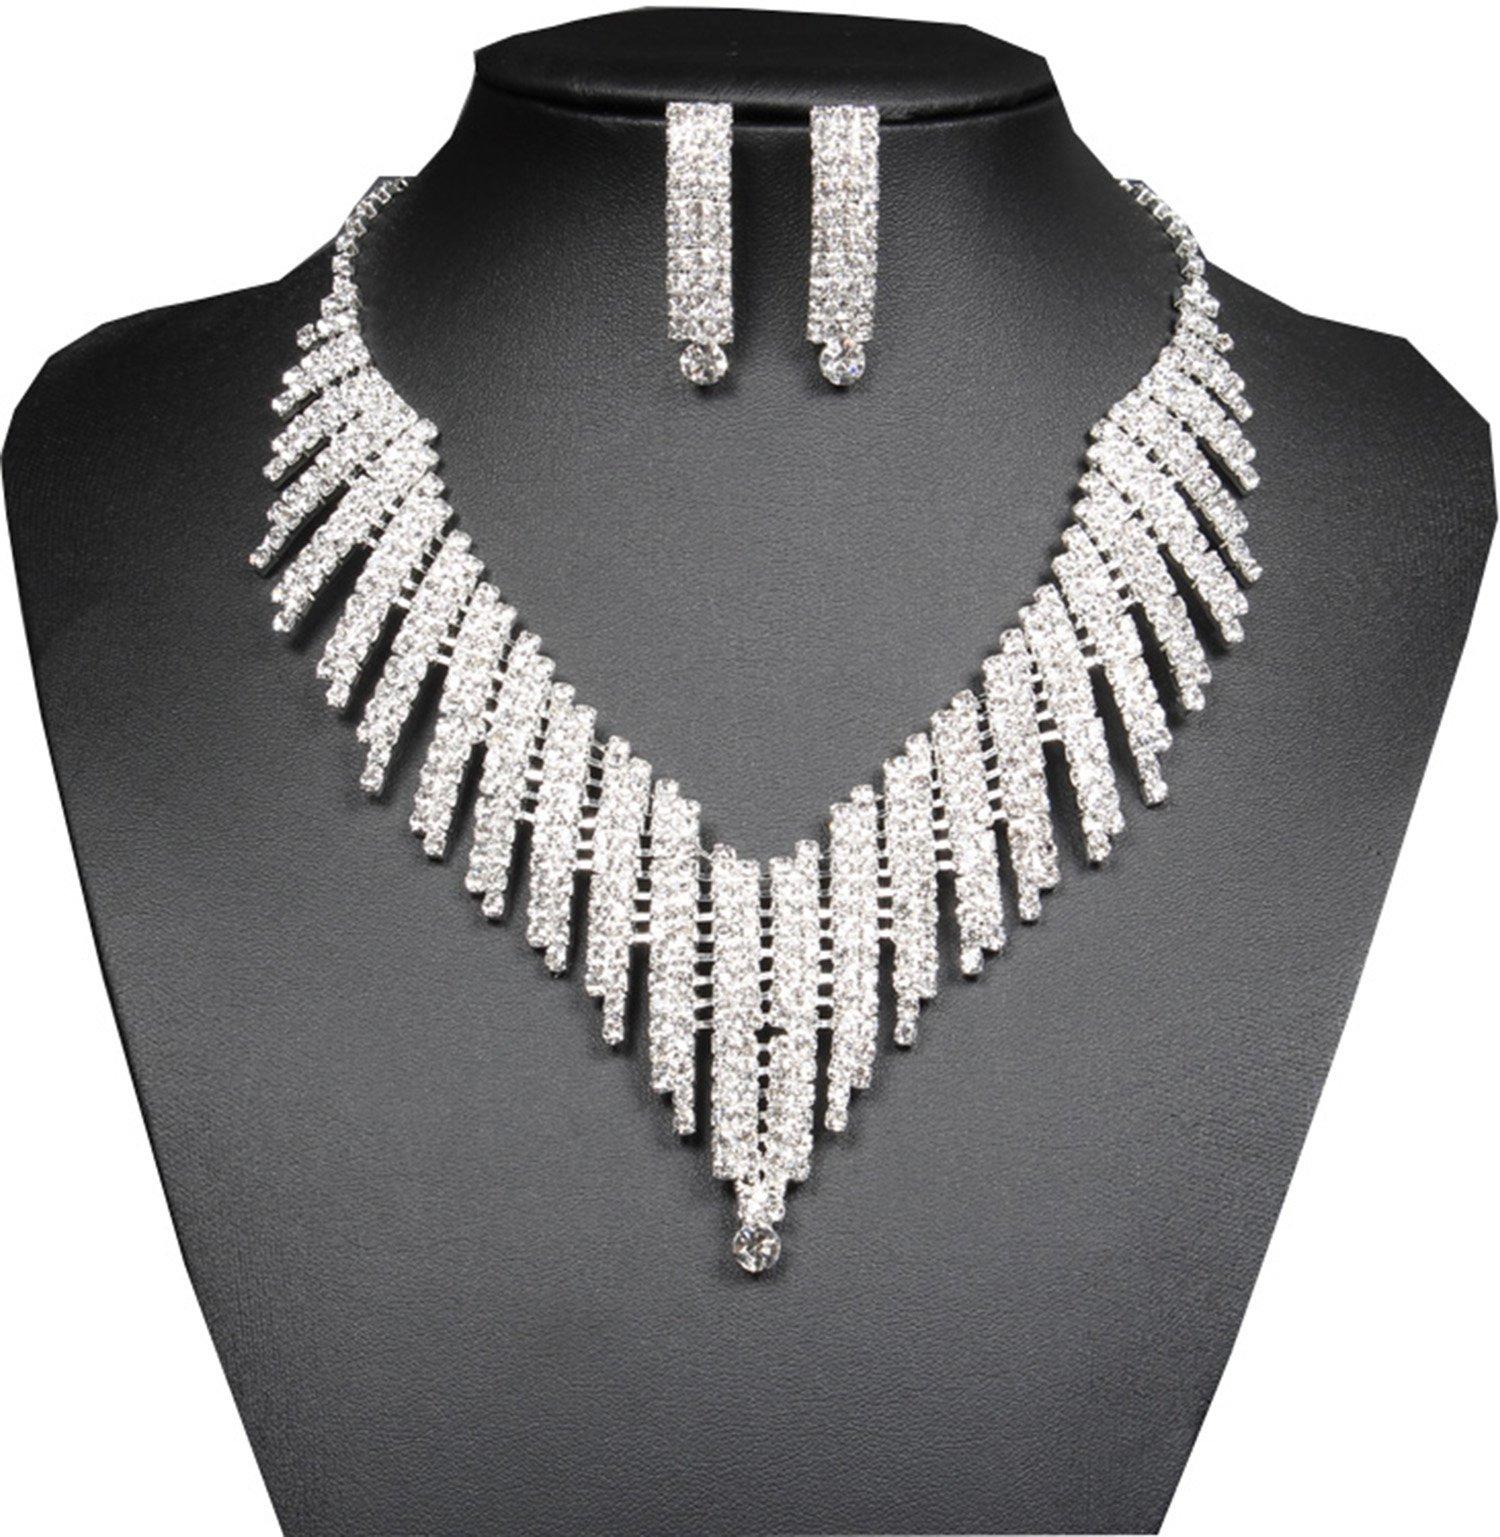 Santfe Crystal Rhinestone Collar Chocker Necklaces Earring Set for Wedding Party (style16)